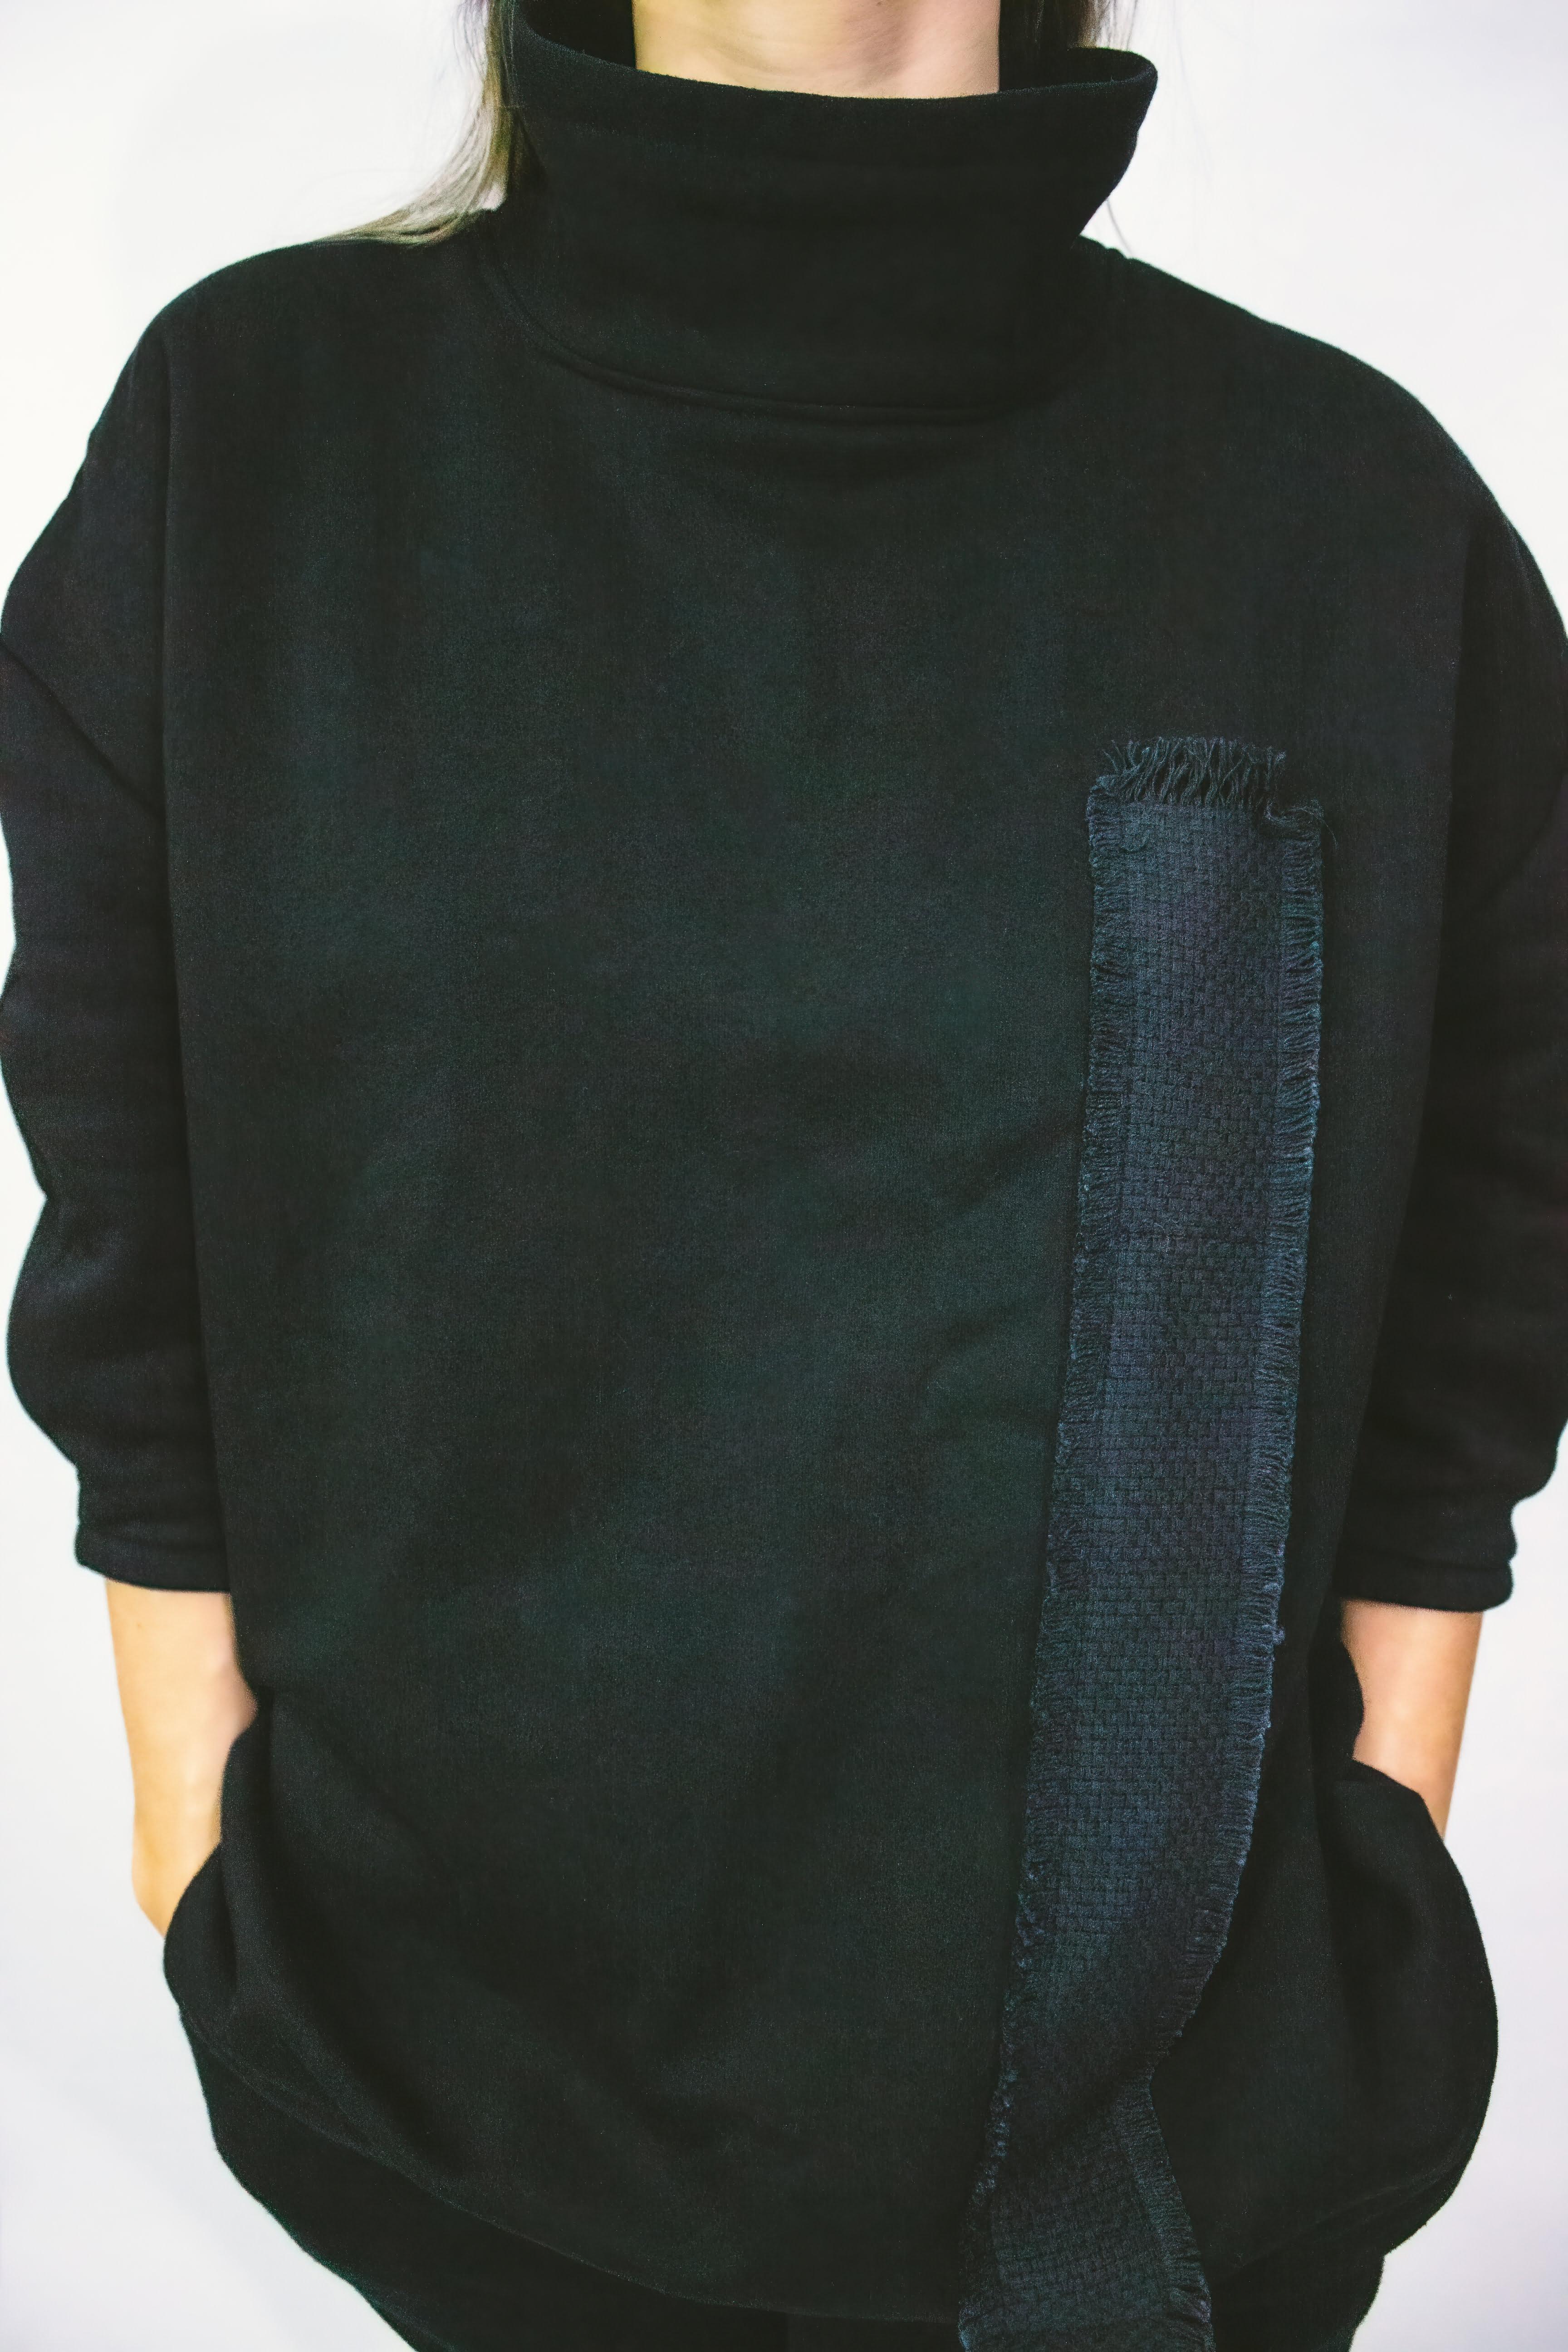 Woman wearing black high-collar sweatshirt